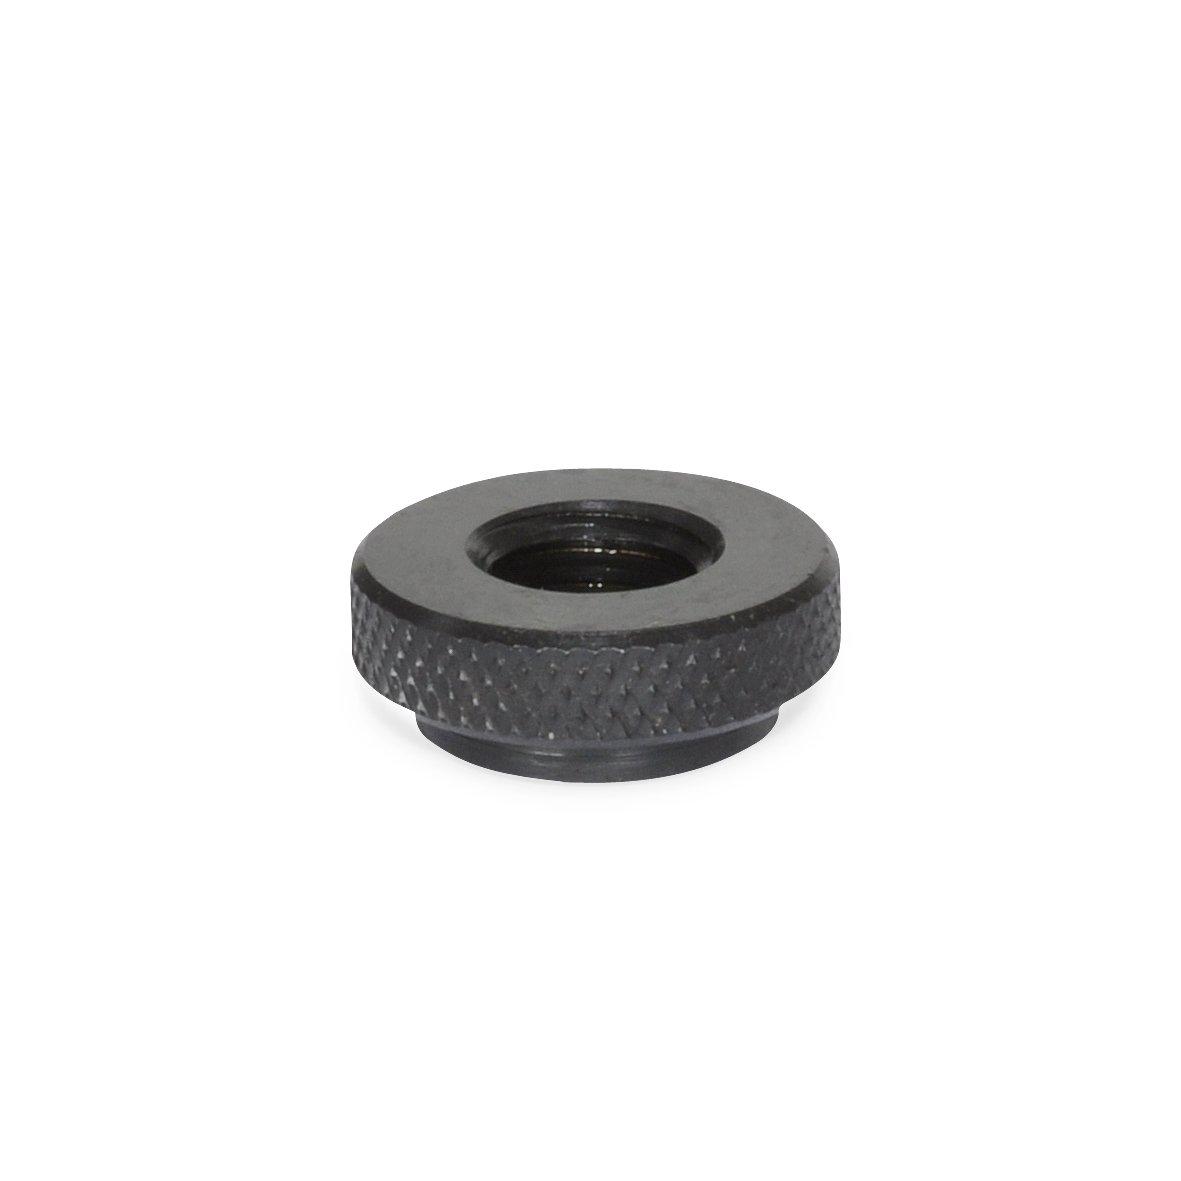 J.W Steel 3//8-16 Thread S/&W Winco L03-5328 CN Check Nut